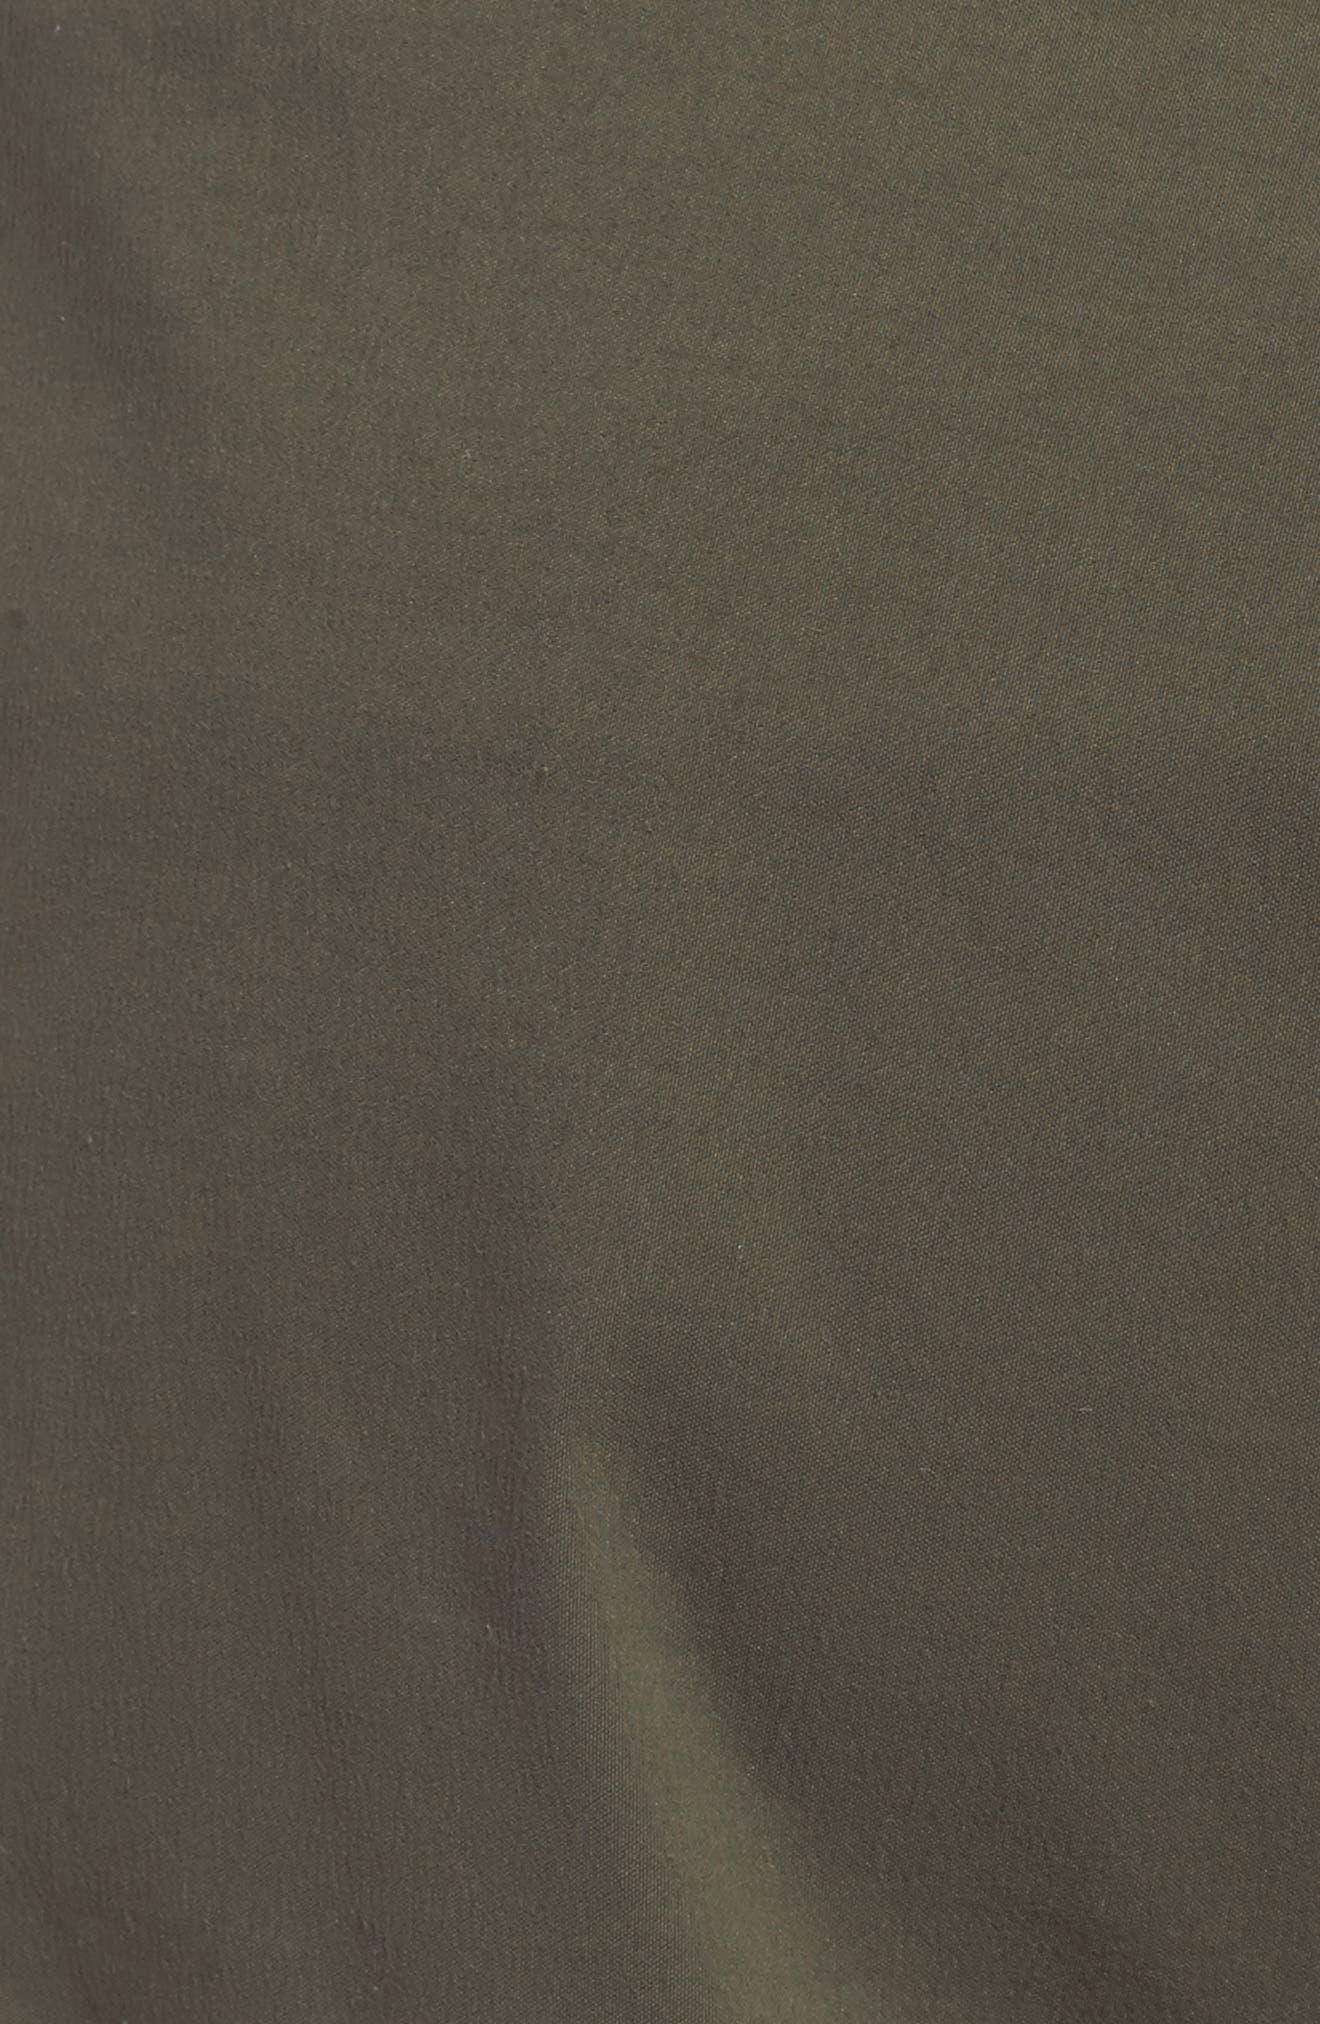 Woven Jogger Pants,                             Alternate thumbnail 5, color,                             Army Green